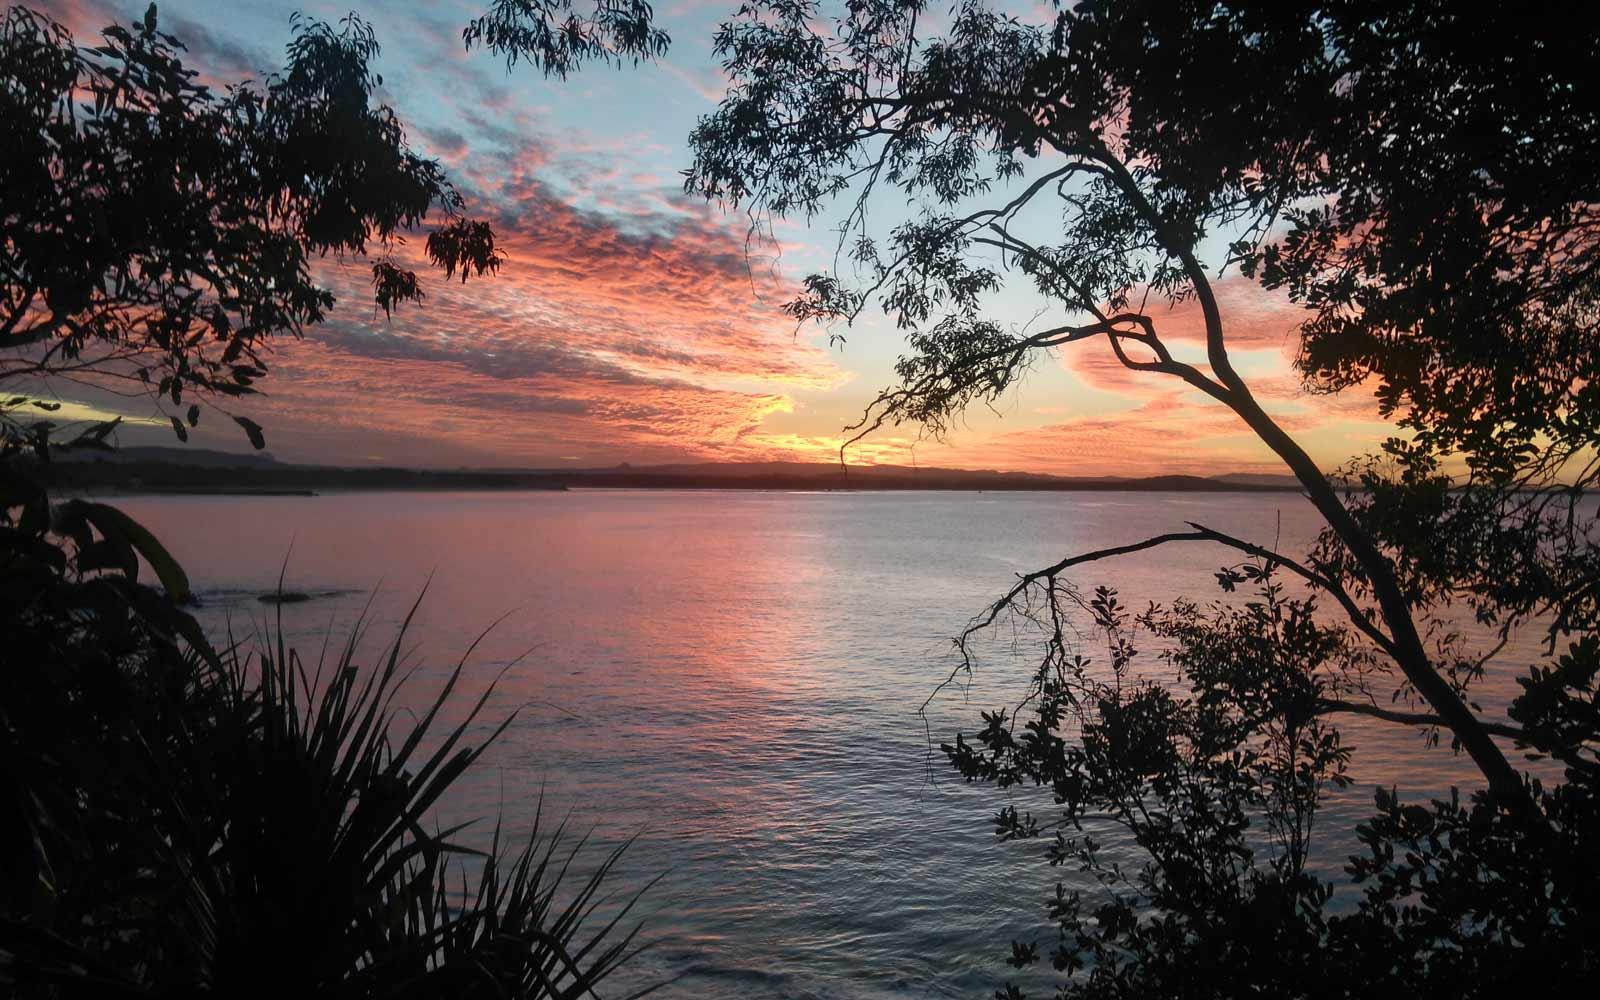 Sonnenuntergang am Meer in Noosa